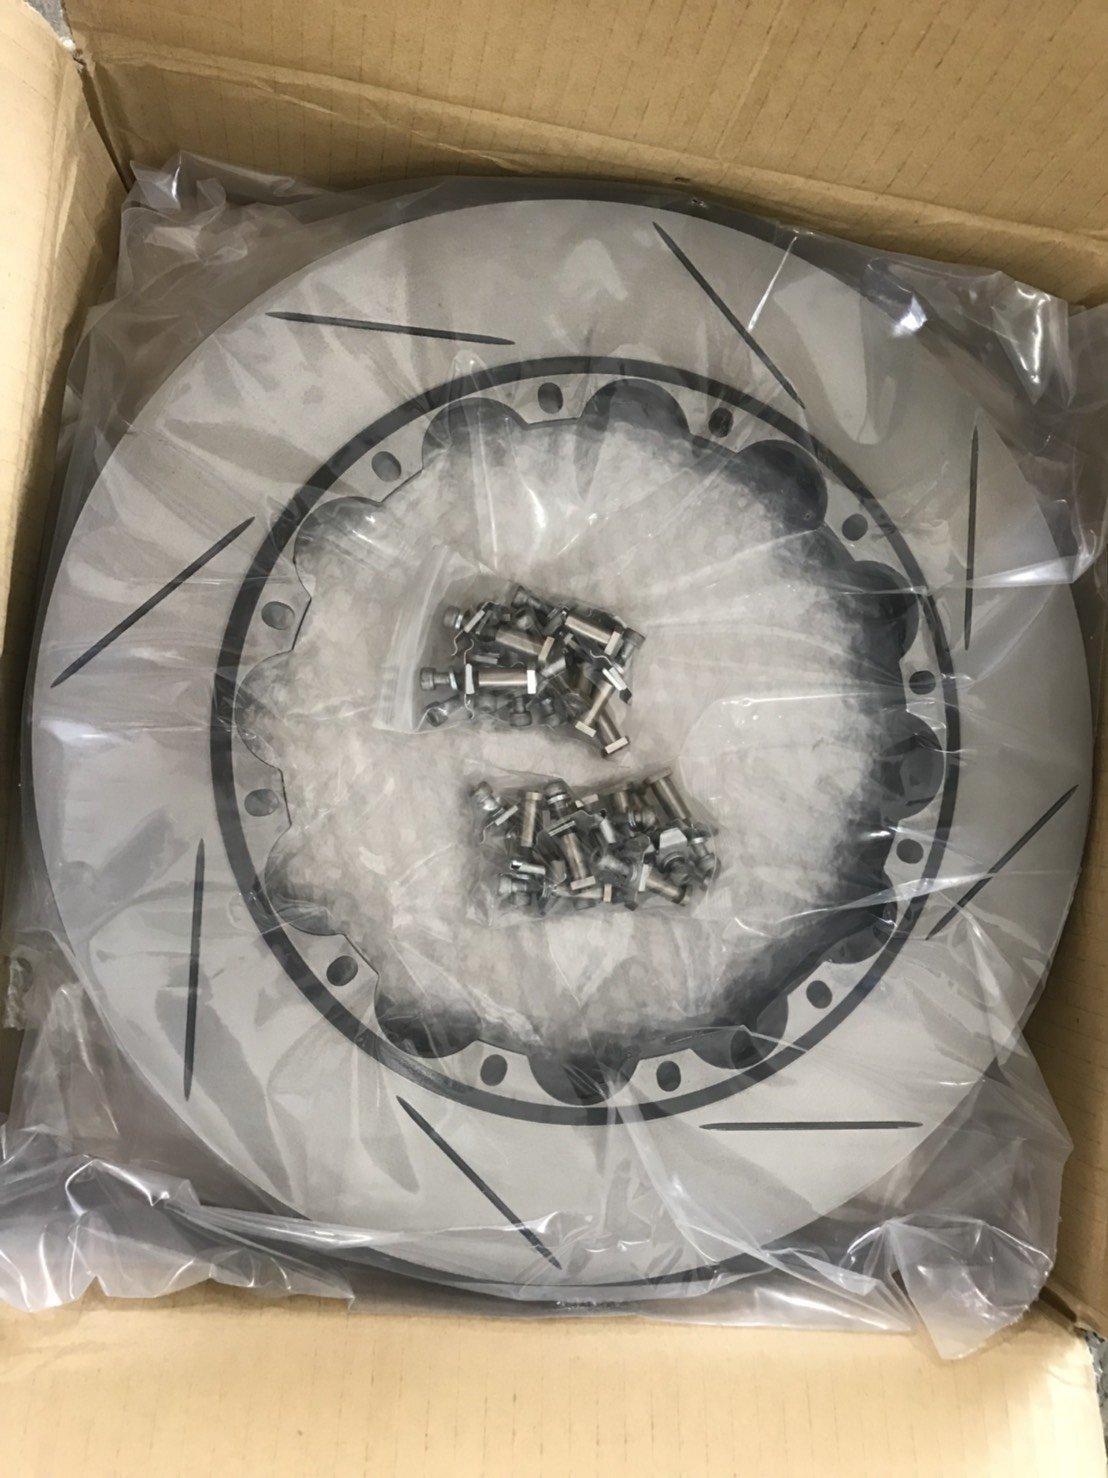 JBT 加大 碟盤 外盤 380MM 附贈螺絲包 一組兩片 12孔